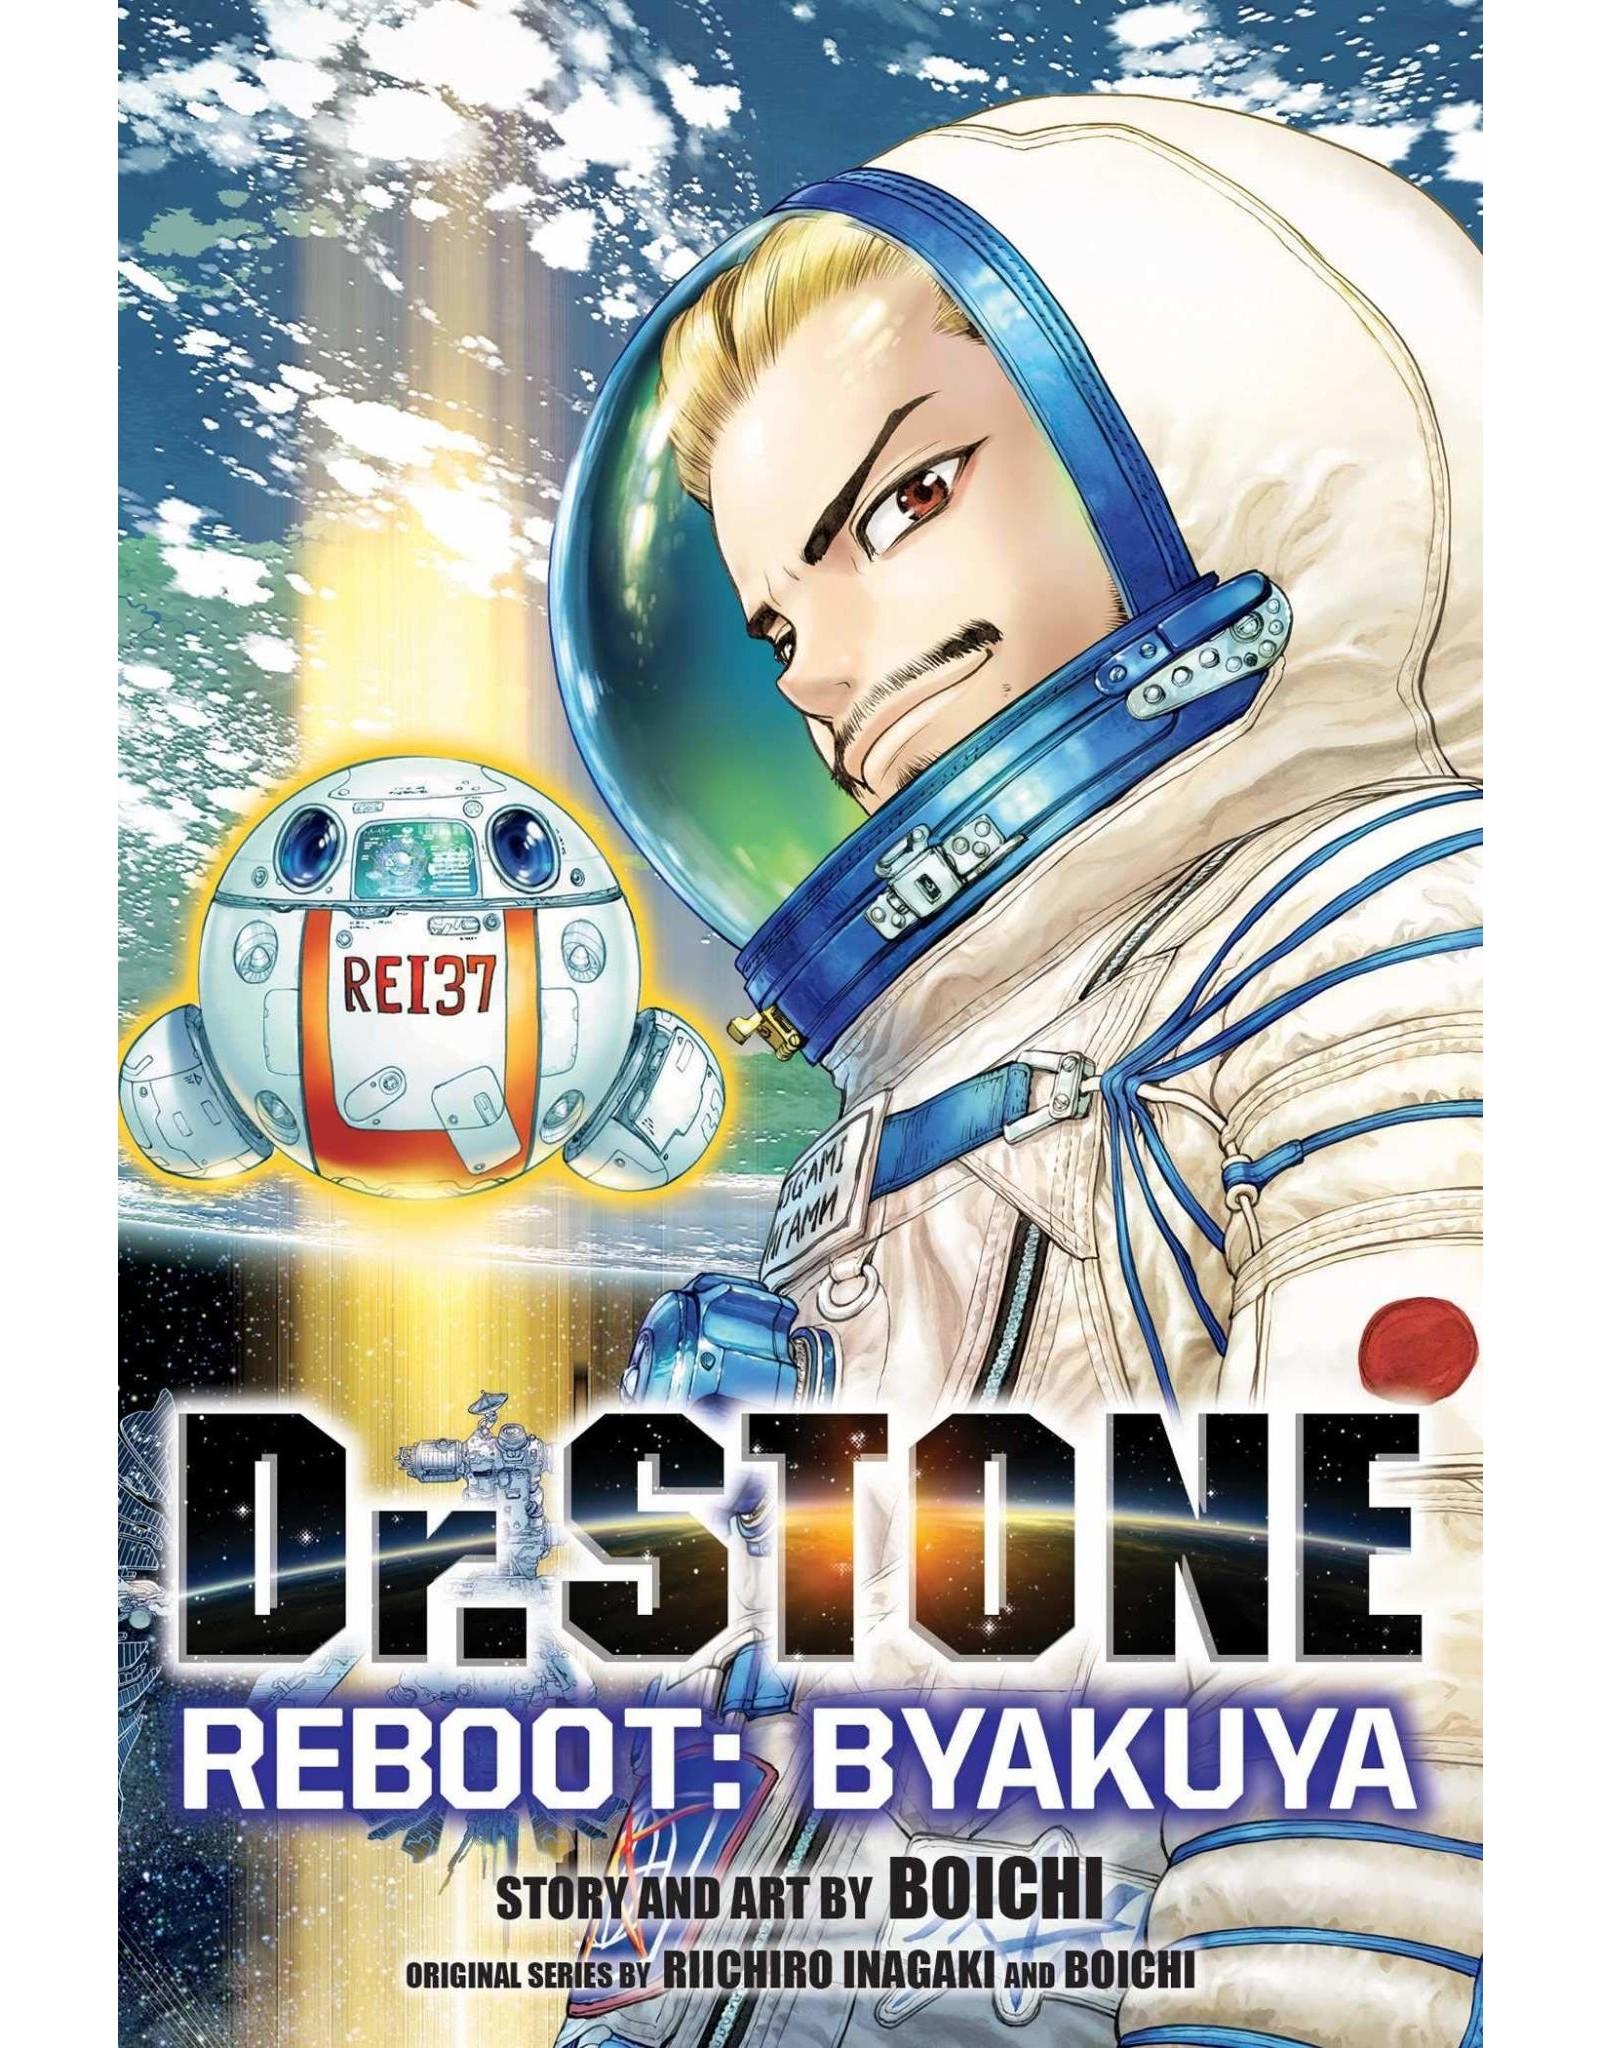 Dr. Stone Reboot: Byakuya (English)